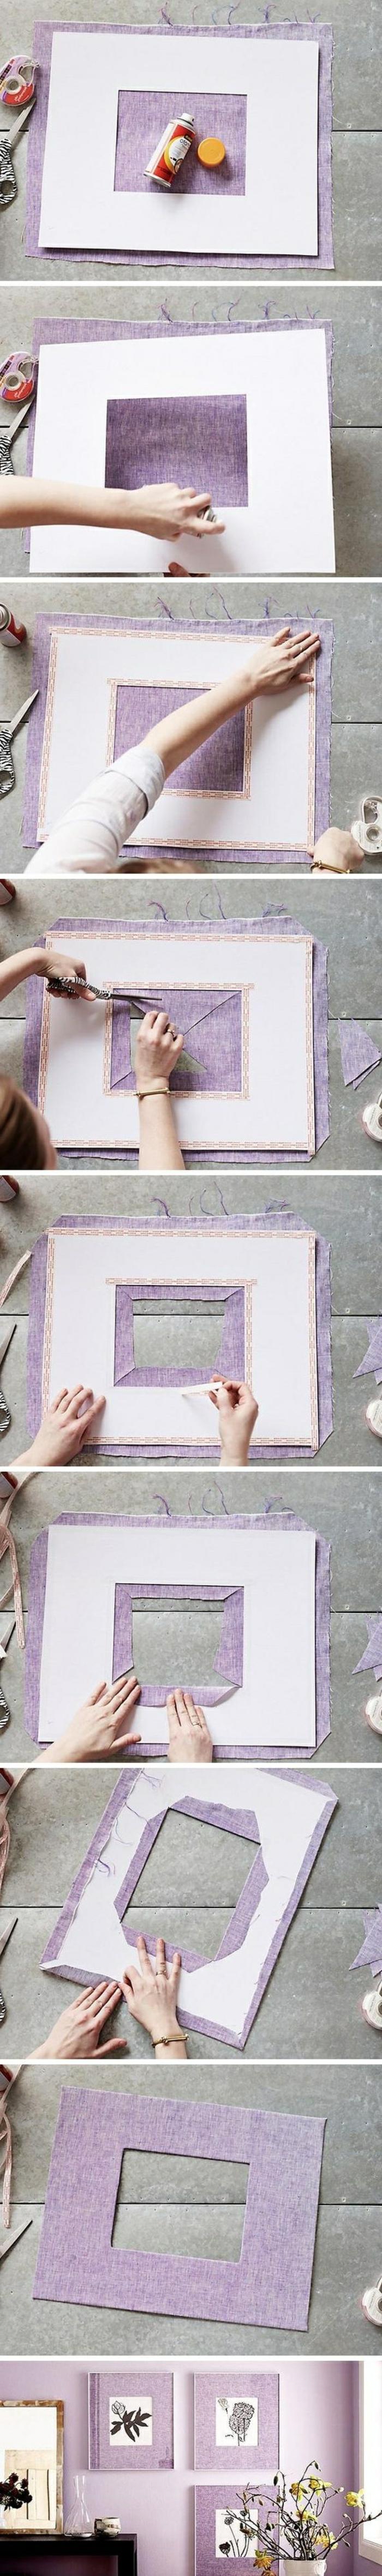 fotorahmen basteln aus lila papier, fotos, fotowand